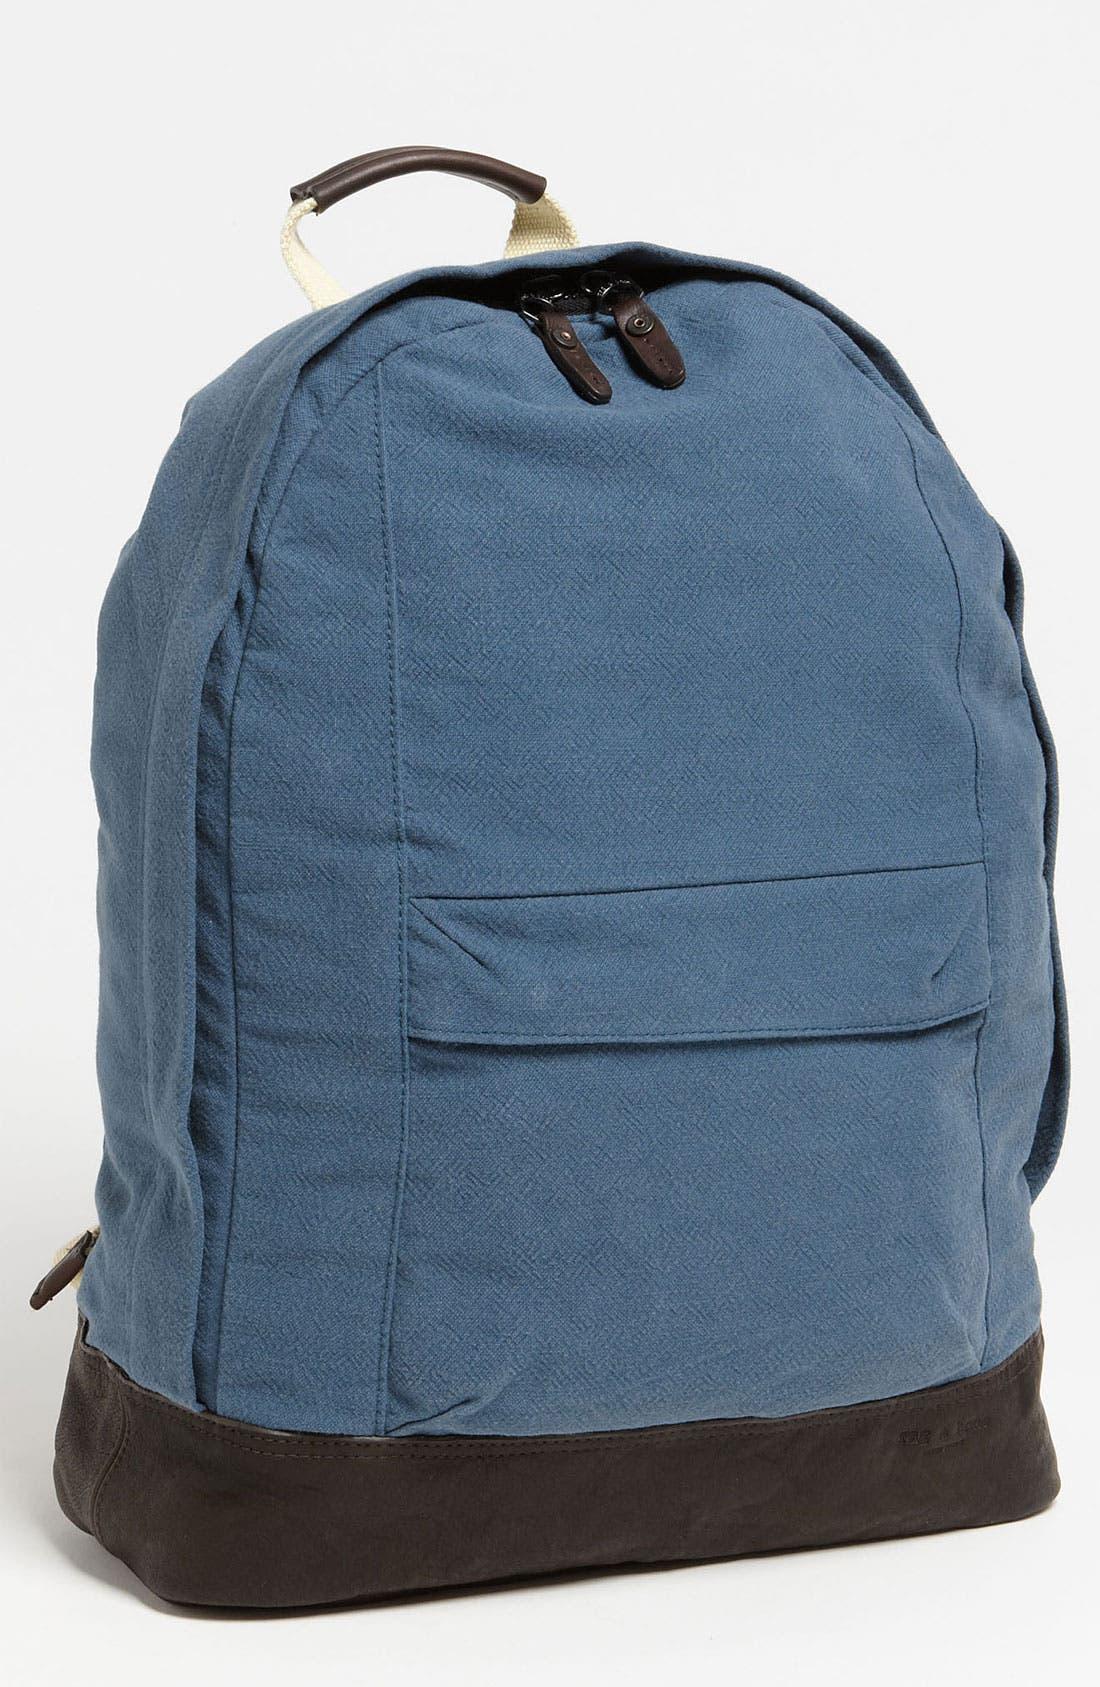 Main Image - rag & bone 'Simple' Backpack